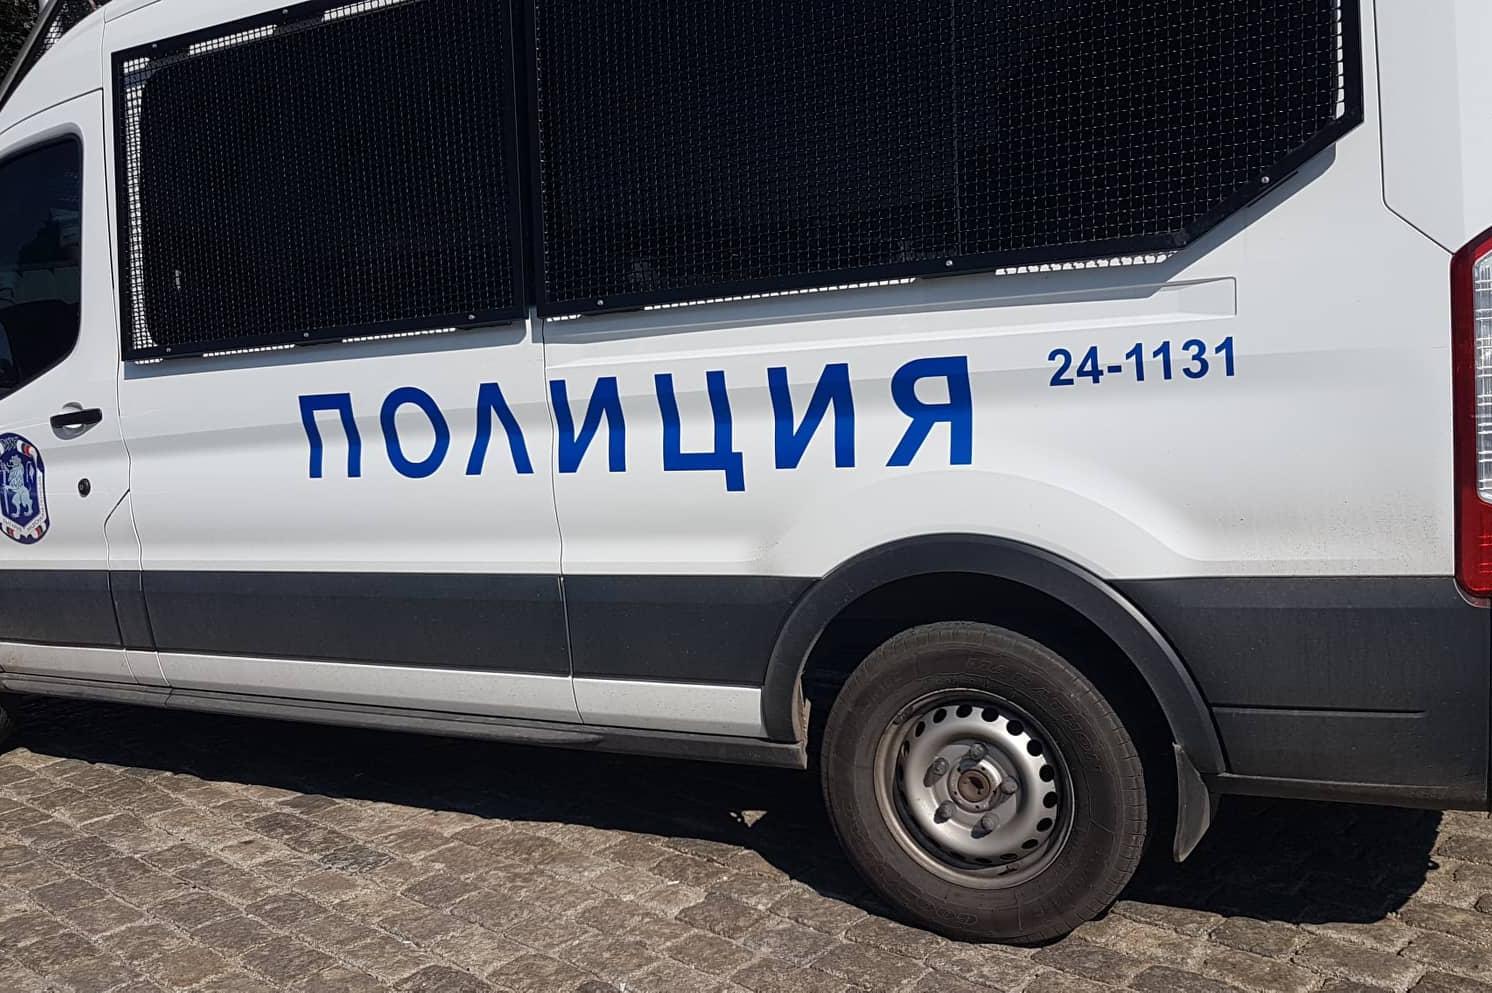 Заловиха жена от Ботевградско, откраднала козметика за 60 лева